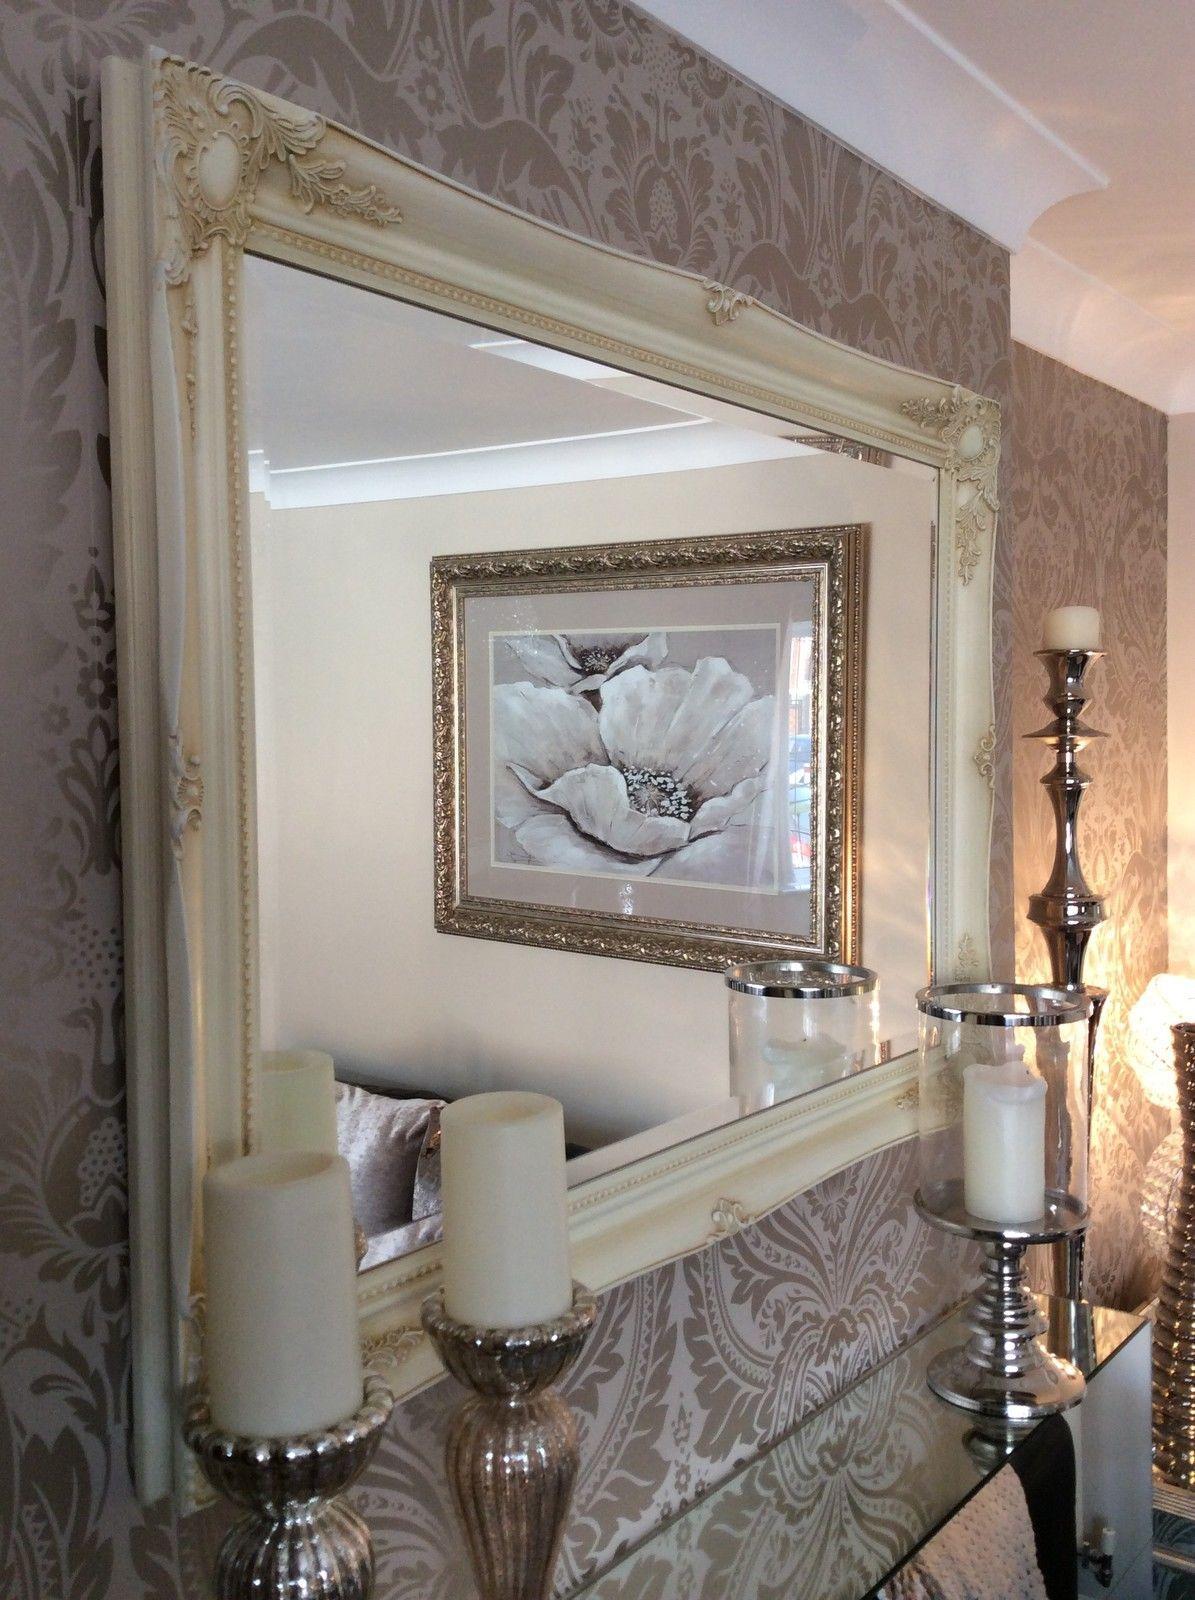 Very Ornate Cream Ivory Shabby Chic French Inspired Mirror - BARGAIN  VQ58